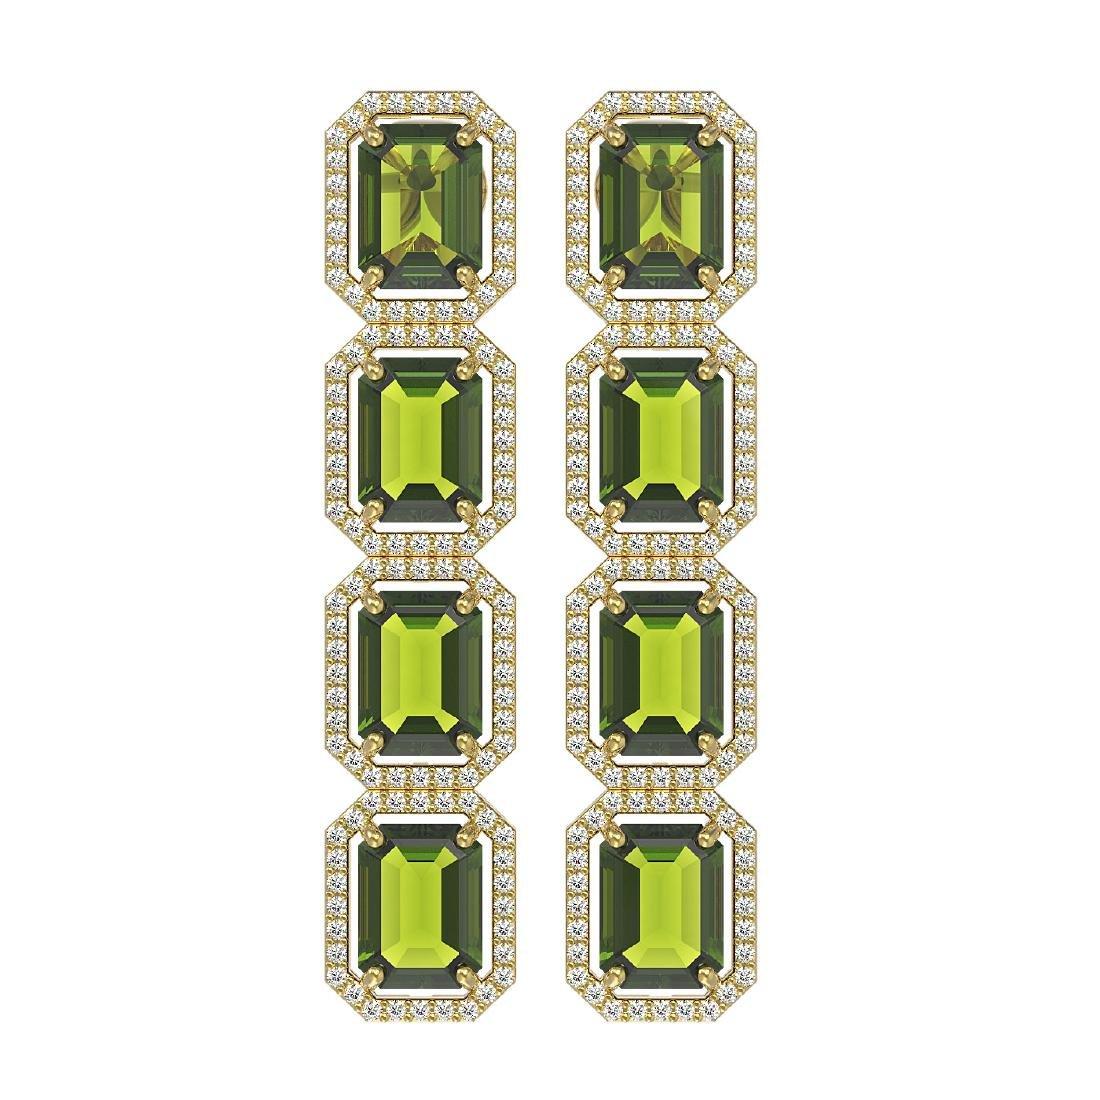 19.44 CTW Tourmaline & Diamond Halo Earrings 10K Yellow